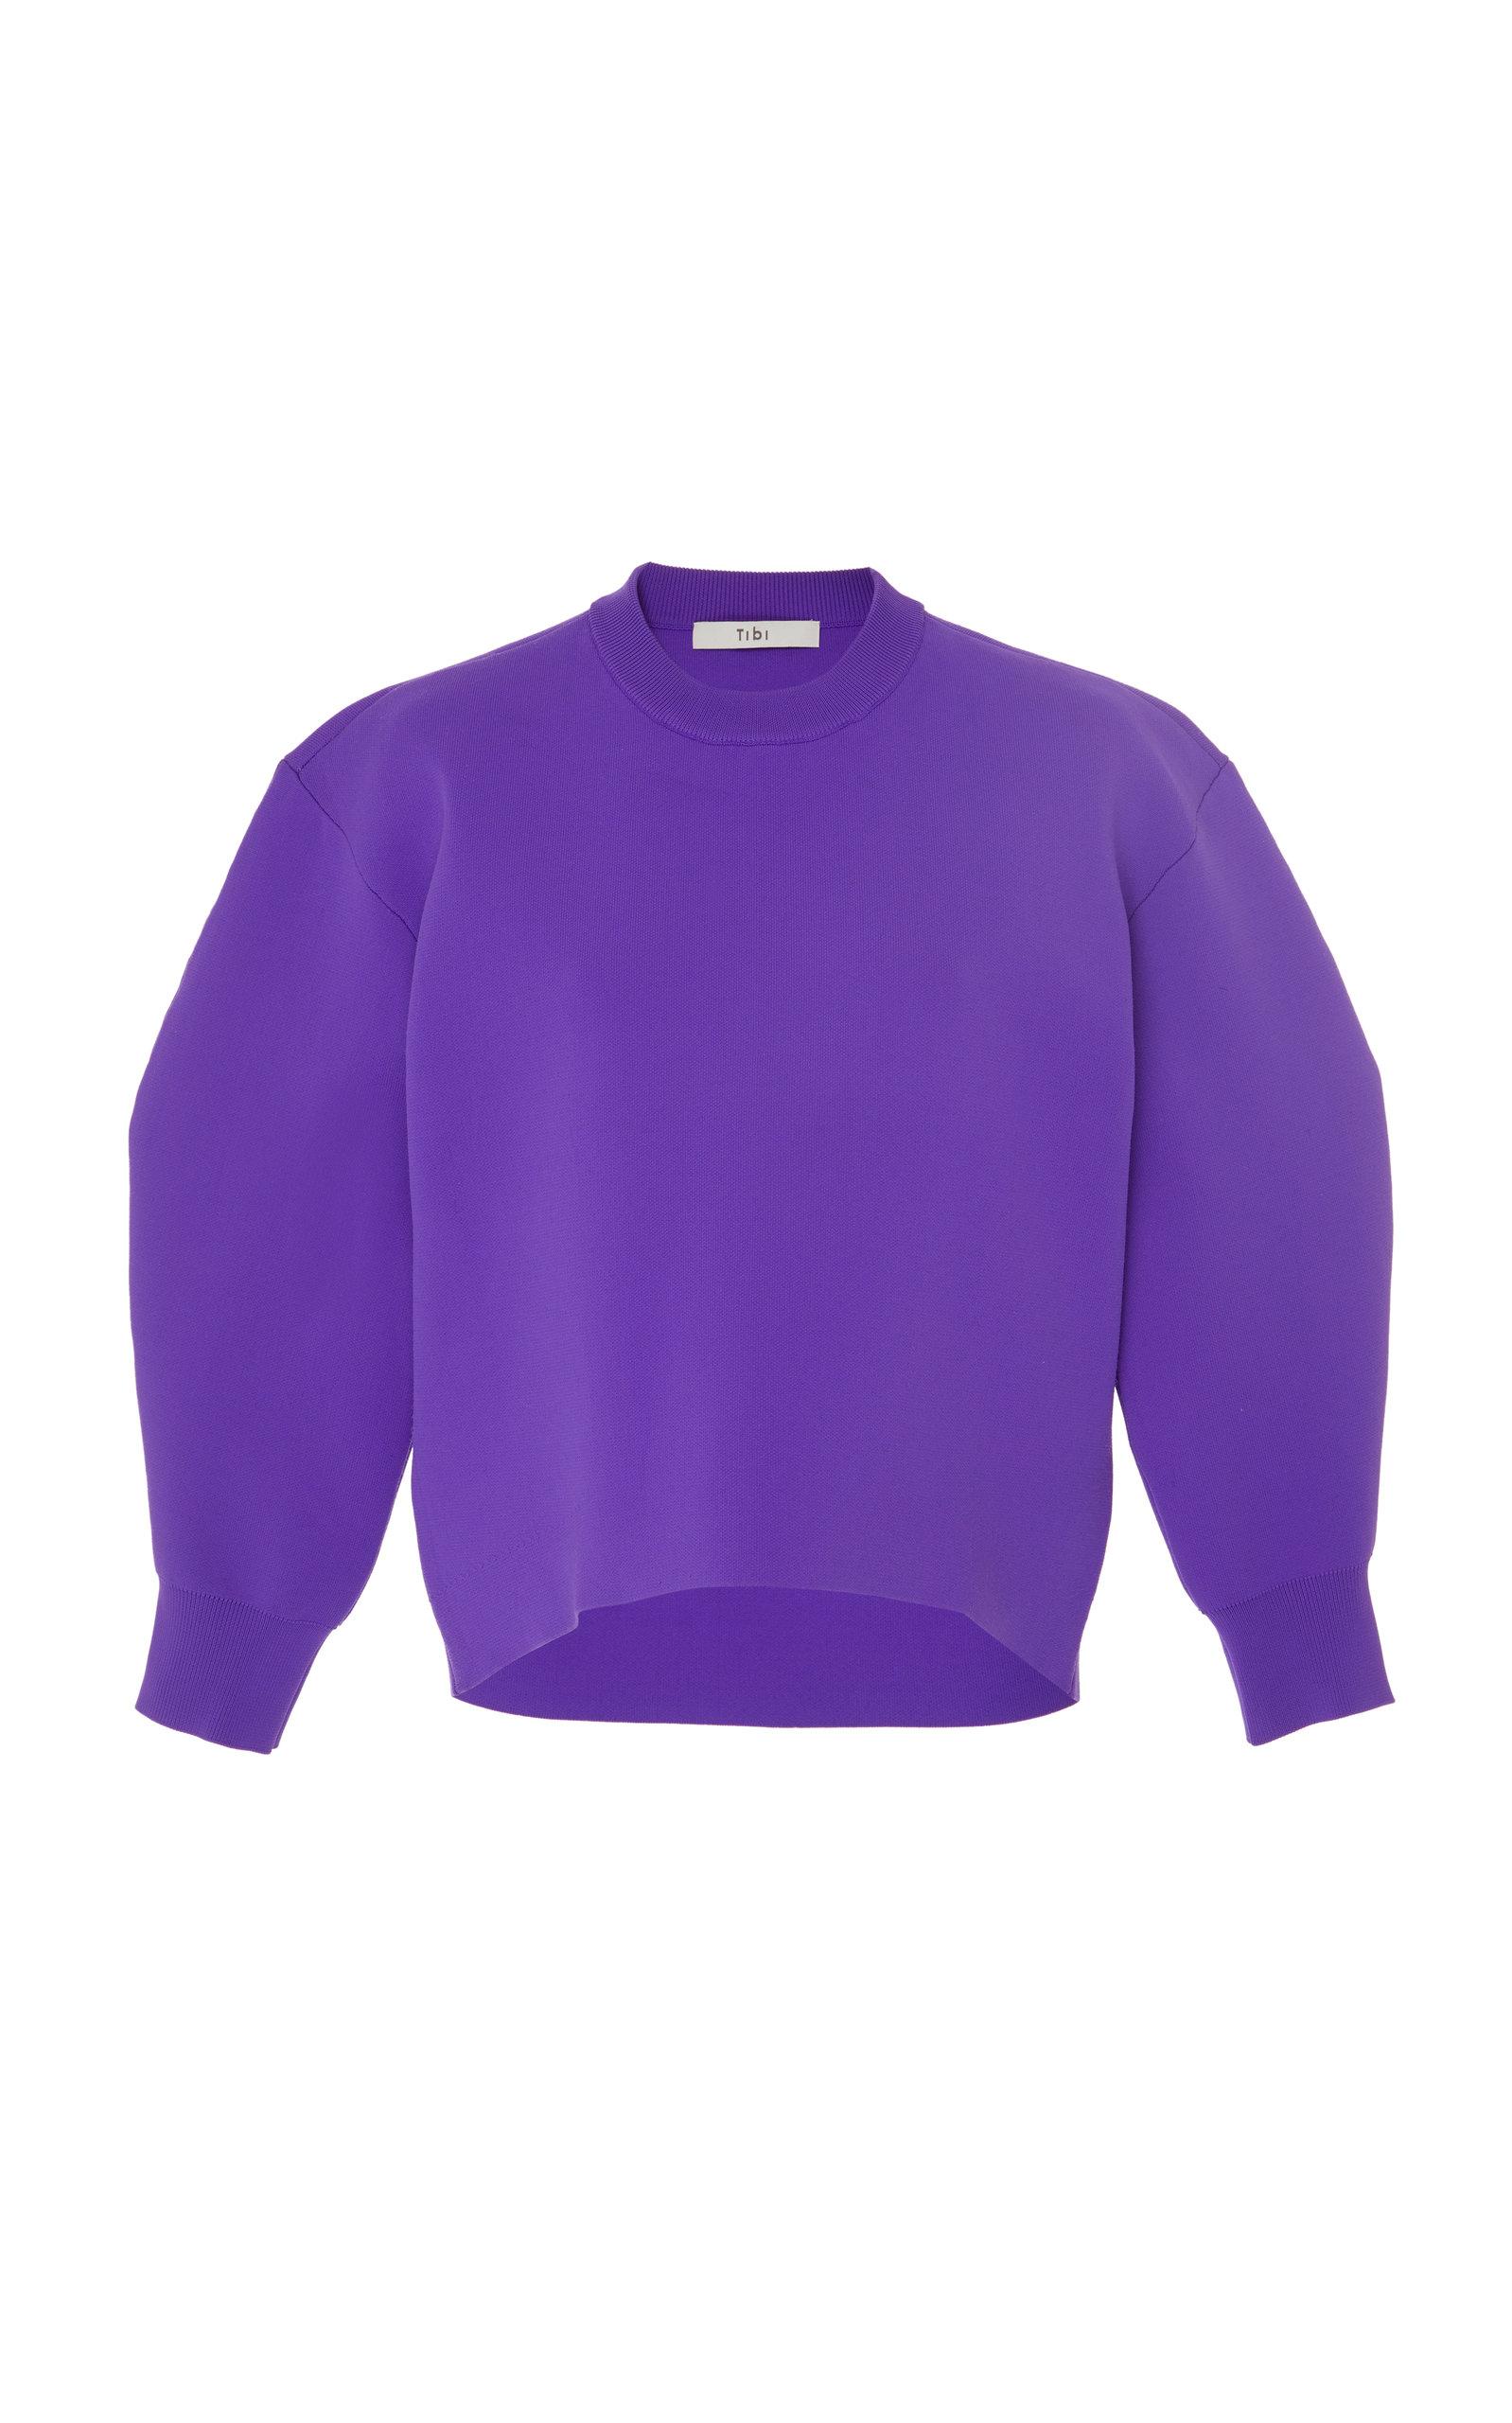 Sculpted Sleeve Sweater, Purple